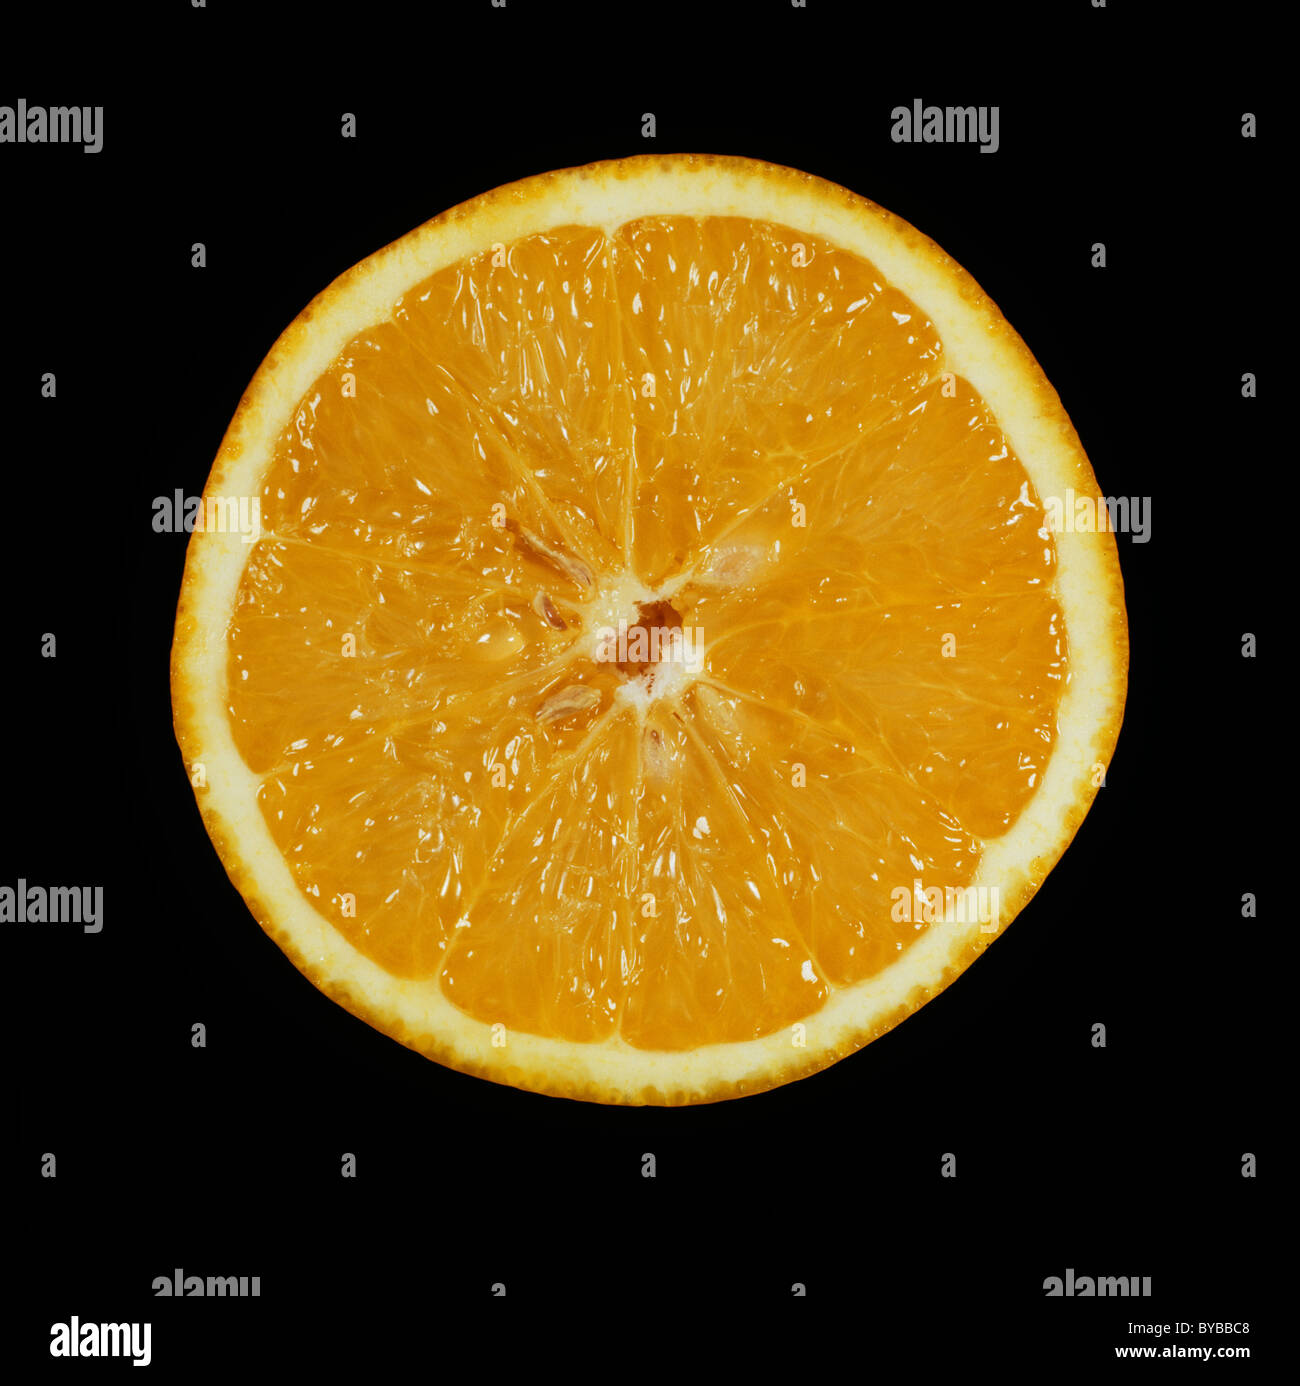 Cut section of a citrus fruit orange variety Pera - Stock Image